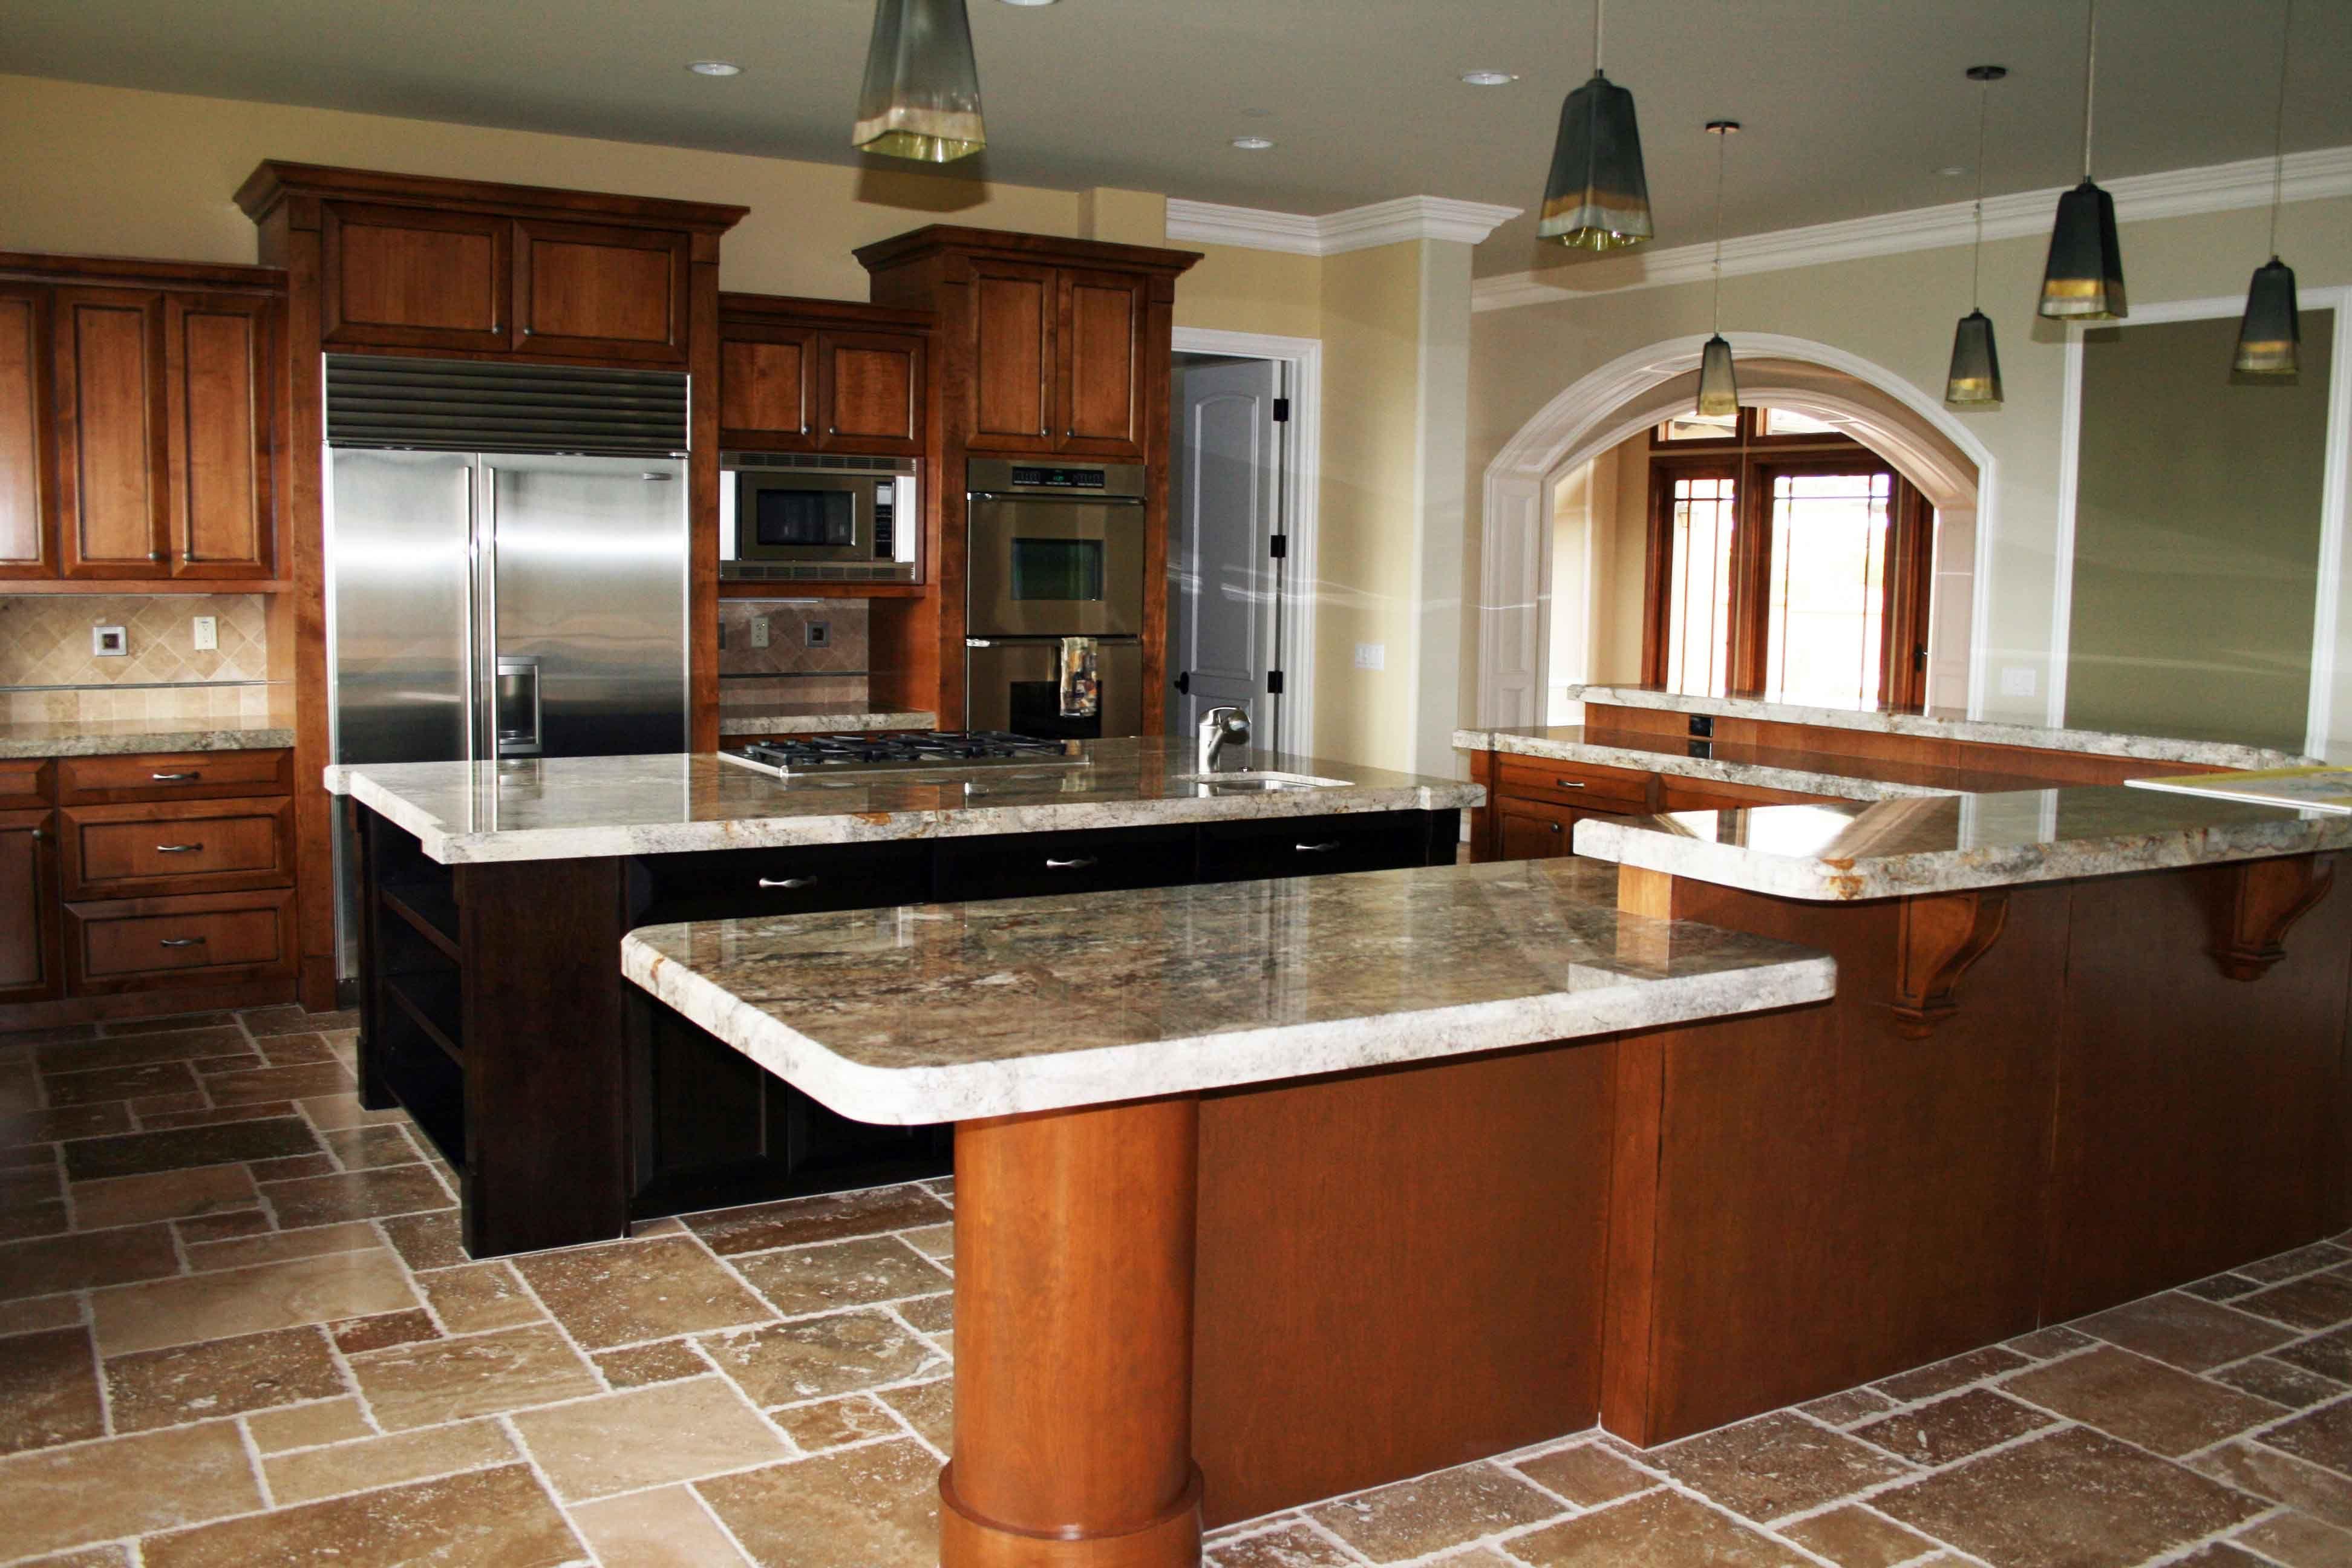 10x10 kitchen remodel cost brick effect wall tiles صور مطابخ امريكاني مودرن 2017 احدث ديكور مطبخ سوبر كايرو